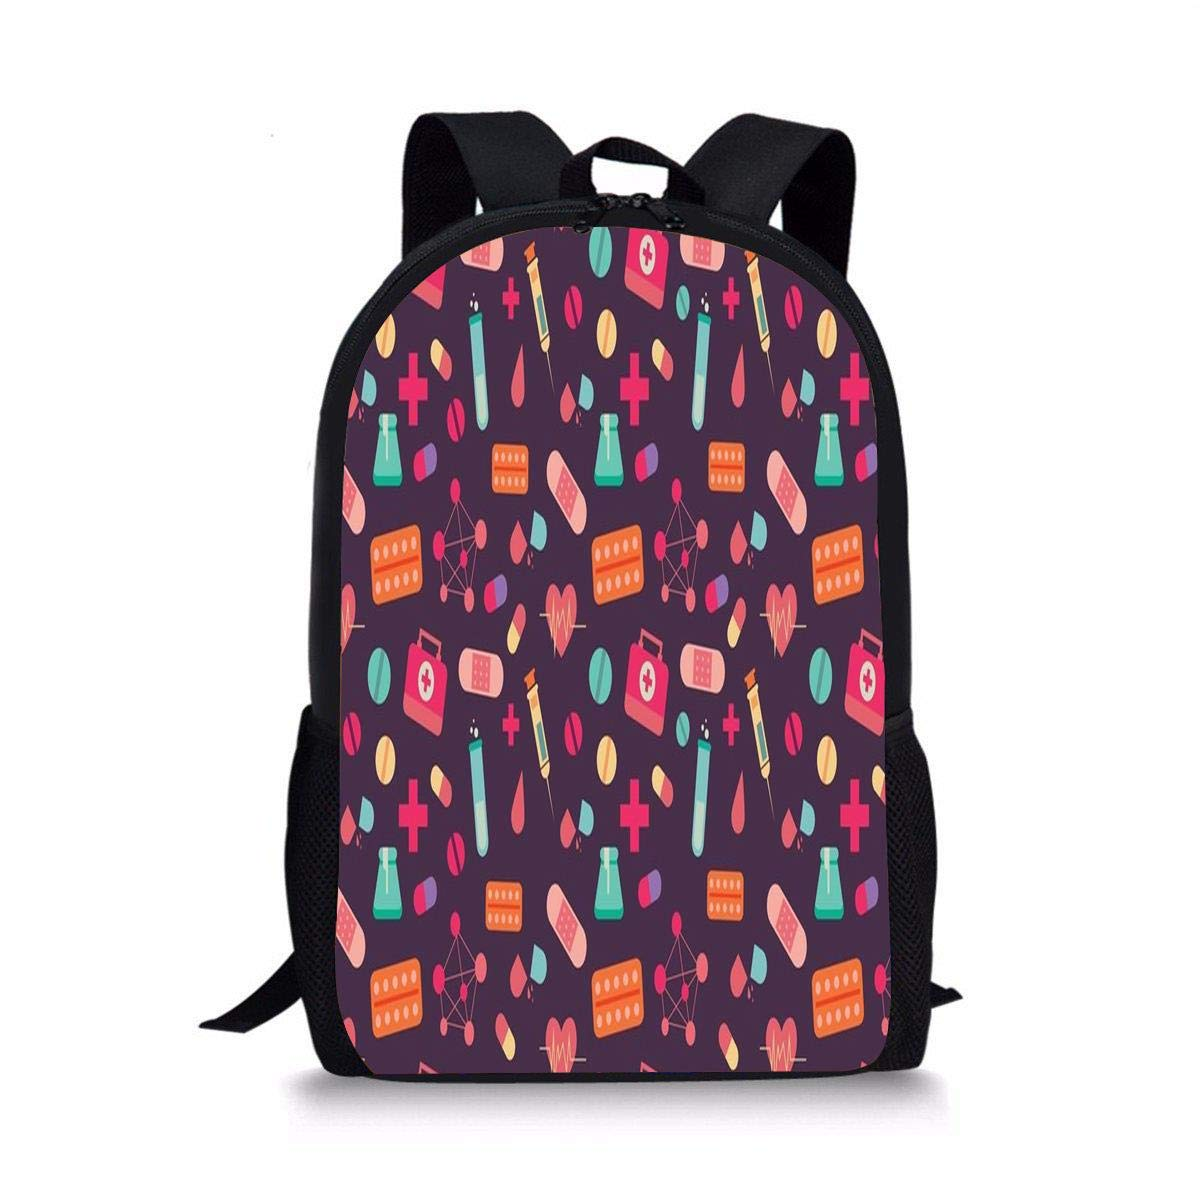 c5243ad6b48 Amazon.com   ISFHJbackbagAD Stay Wild1 Cute Print School Backpack For Boys  Girls School Book Bags   Kids  Backpacks